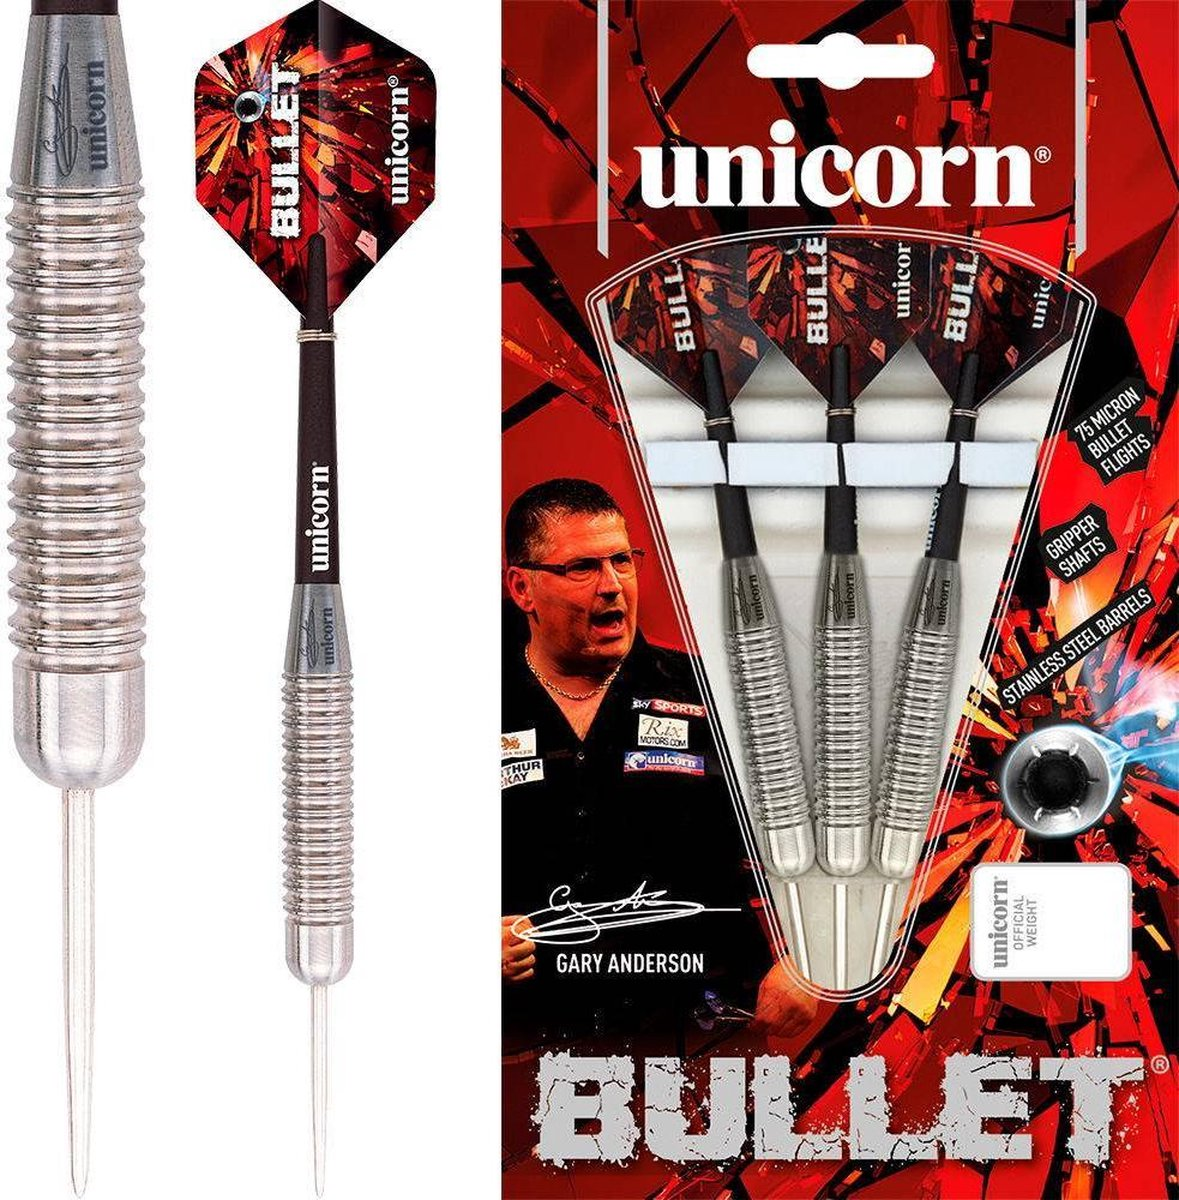 Unicorn Bullet Gary Anderson P1 - 22 Gram